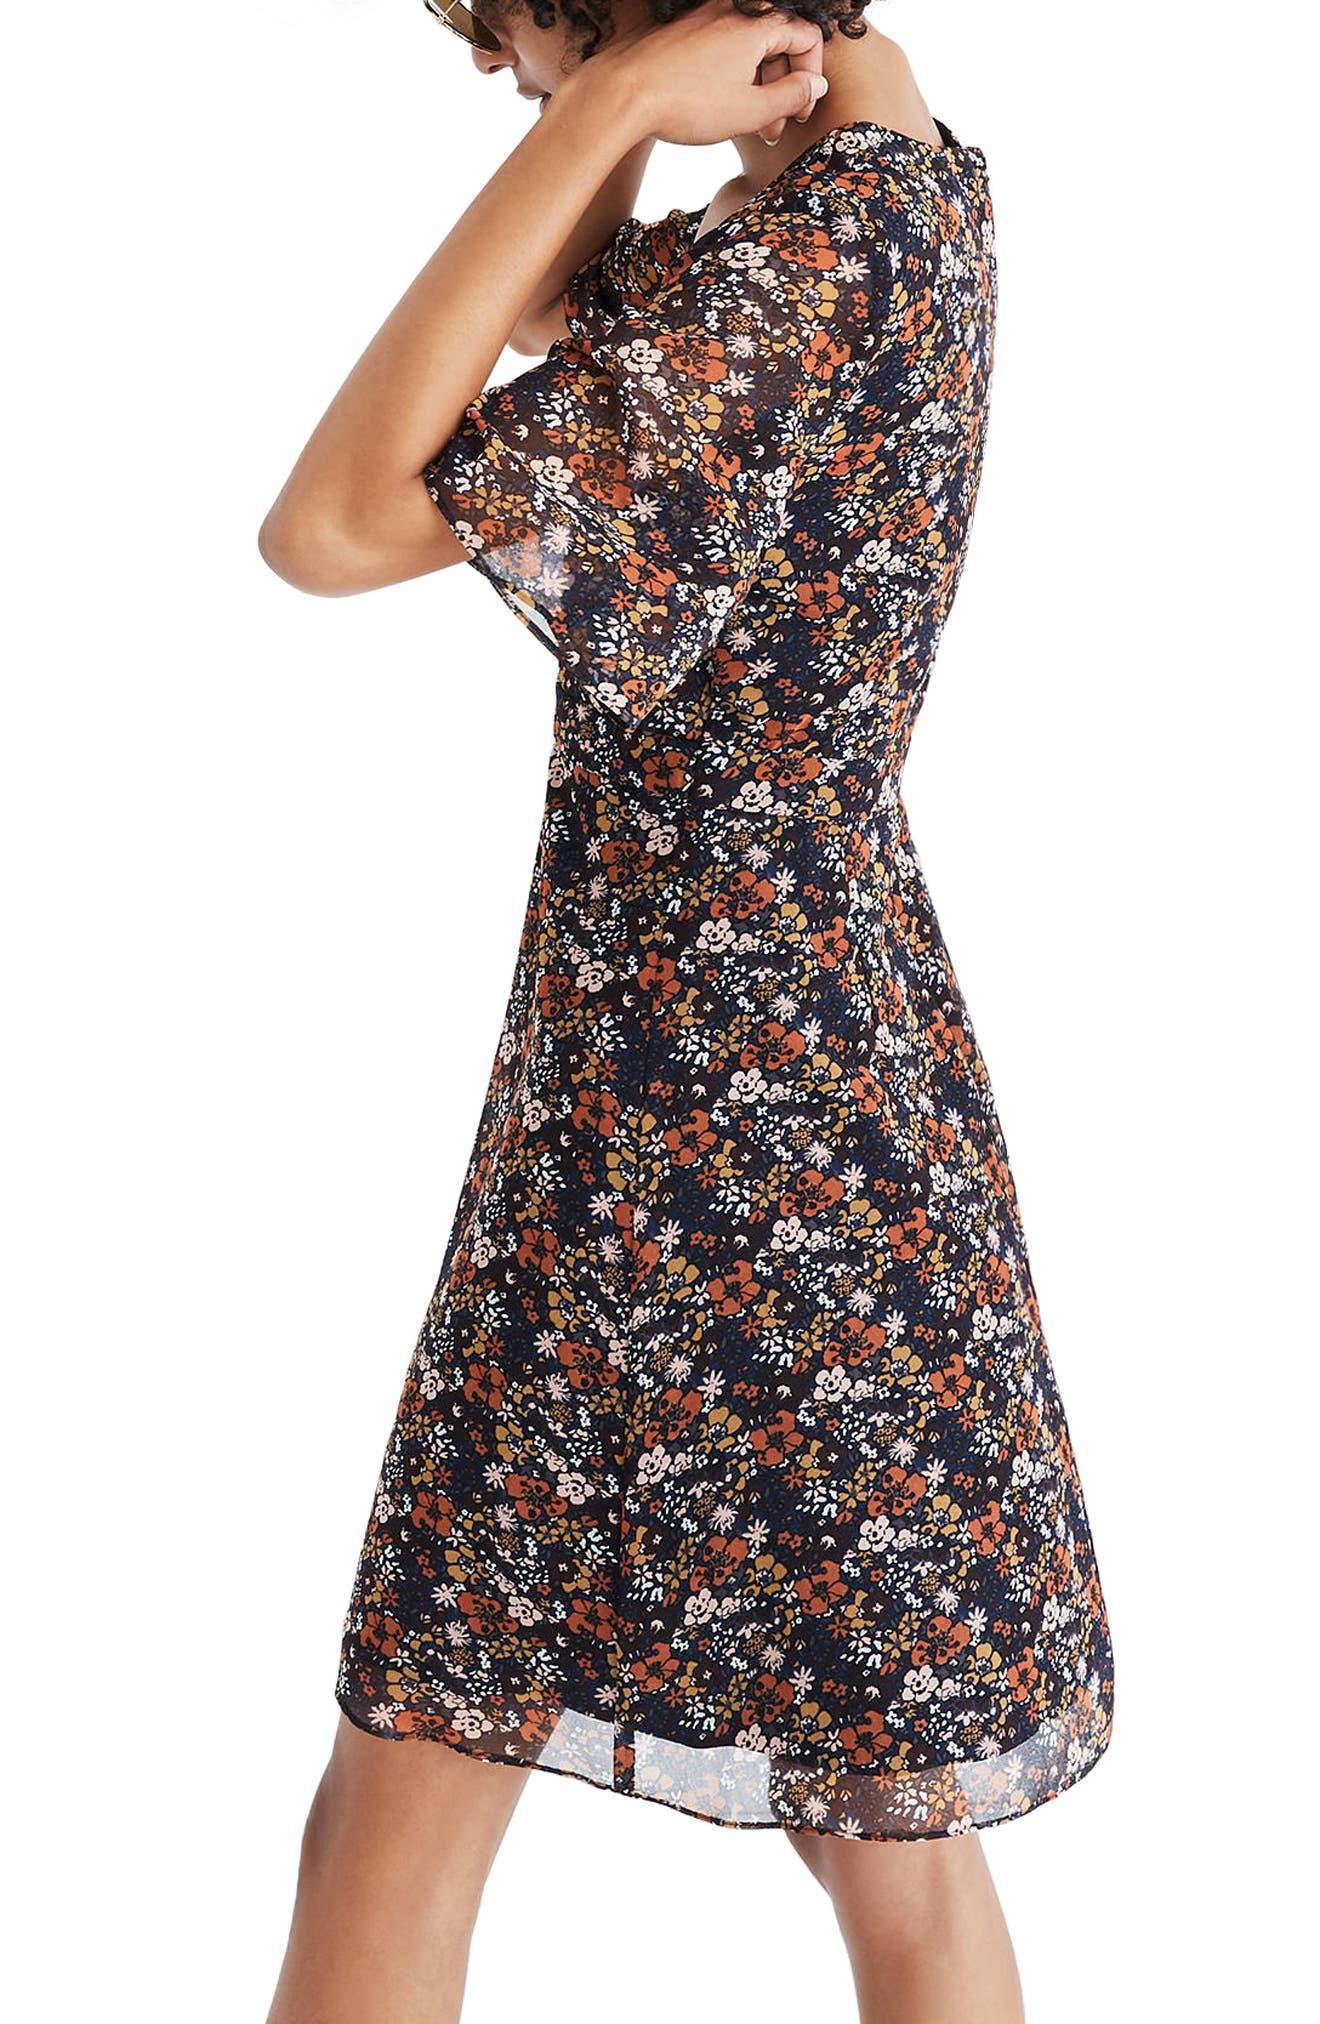 Orchard Flutter Sleeve Dress,                             Alternate thumbnail 2, color,                             Woodland Warm Nutmeg